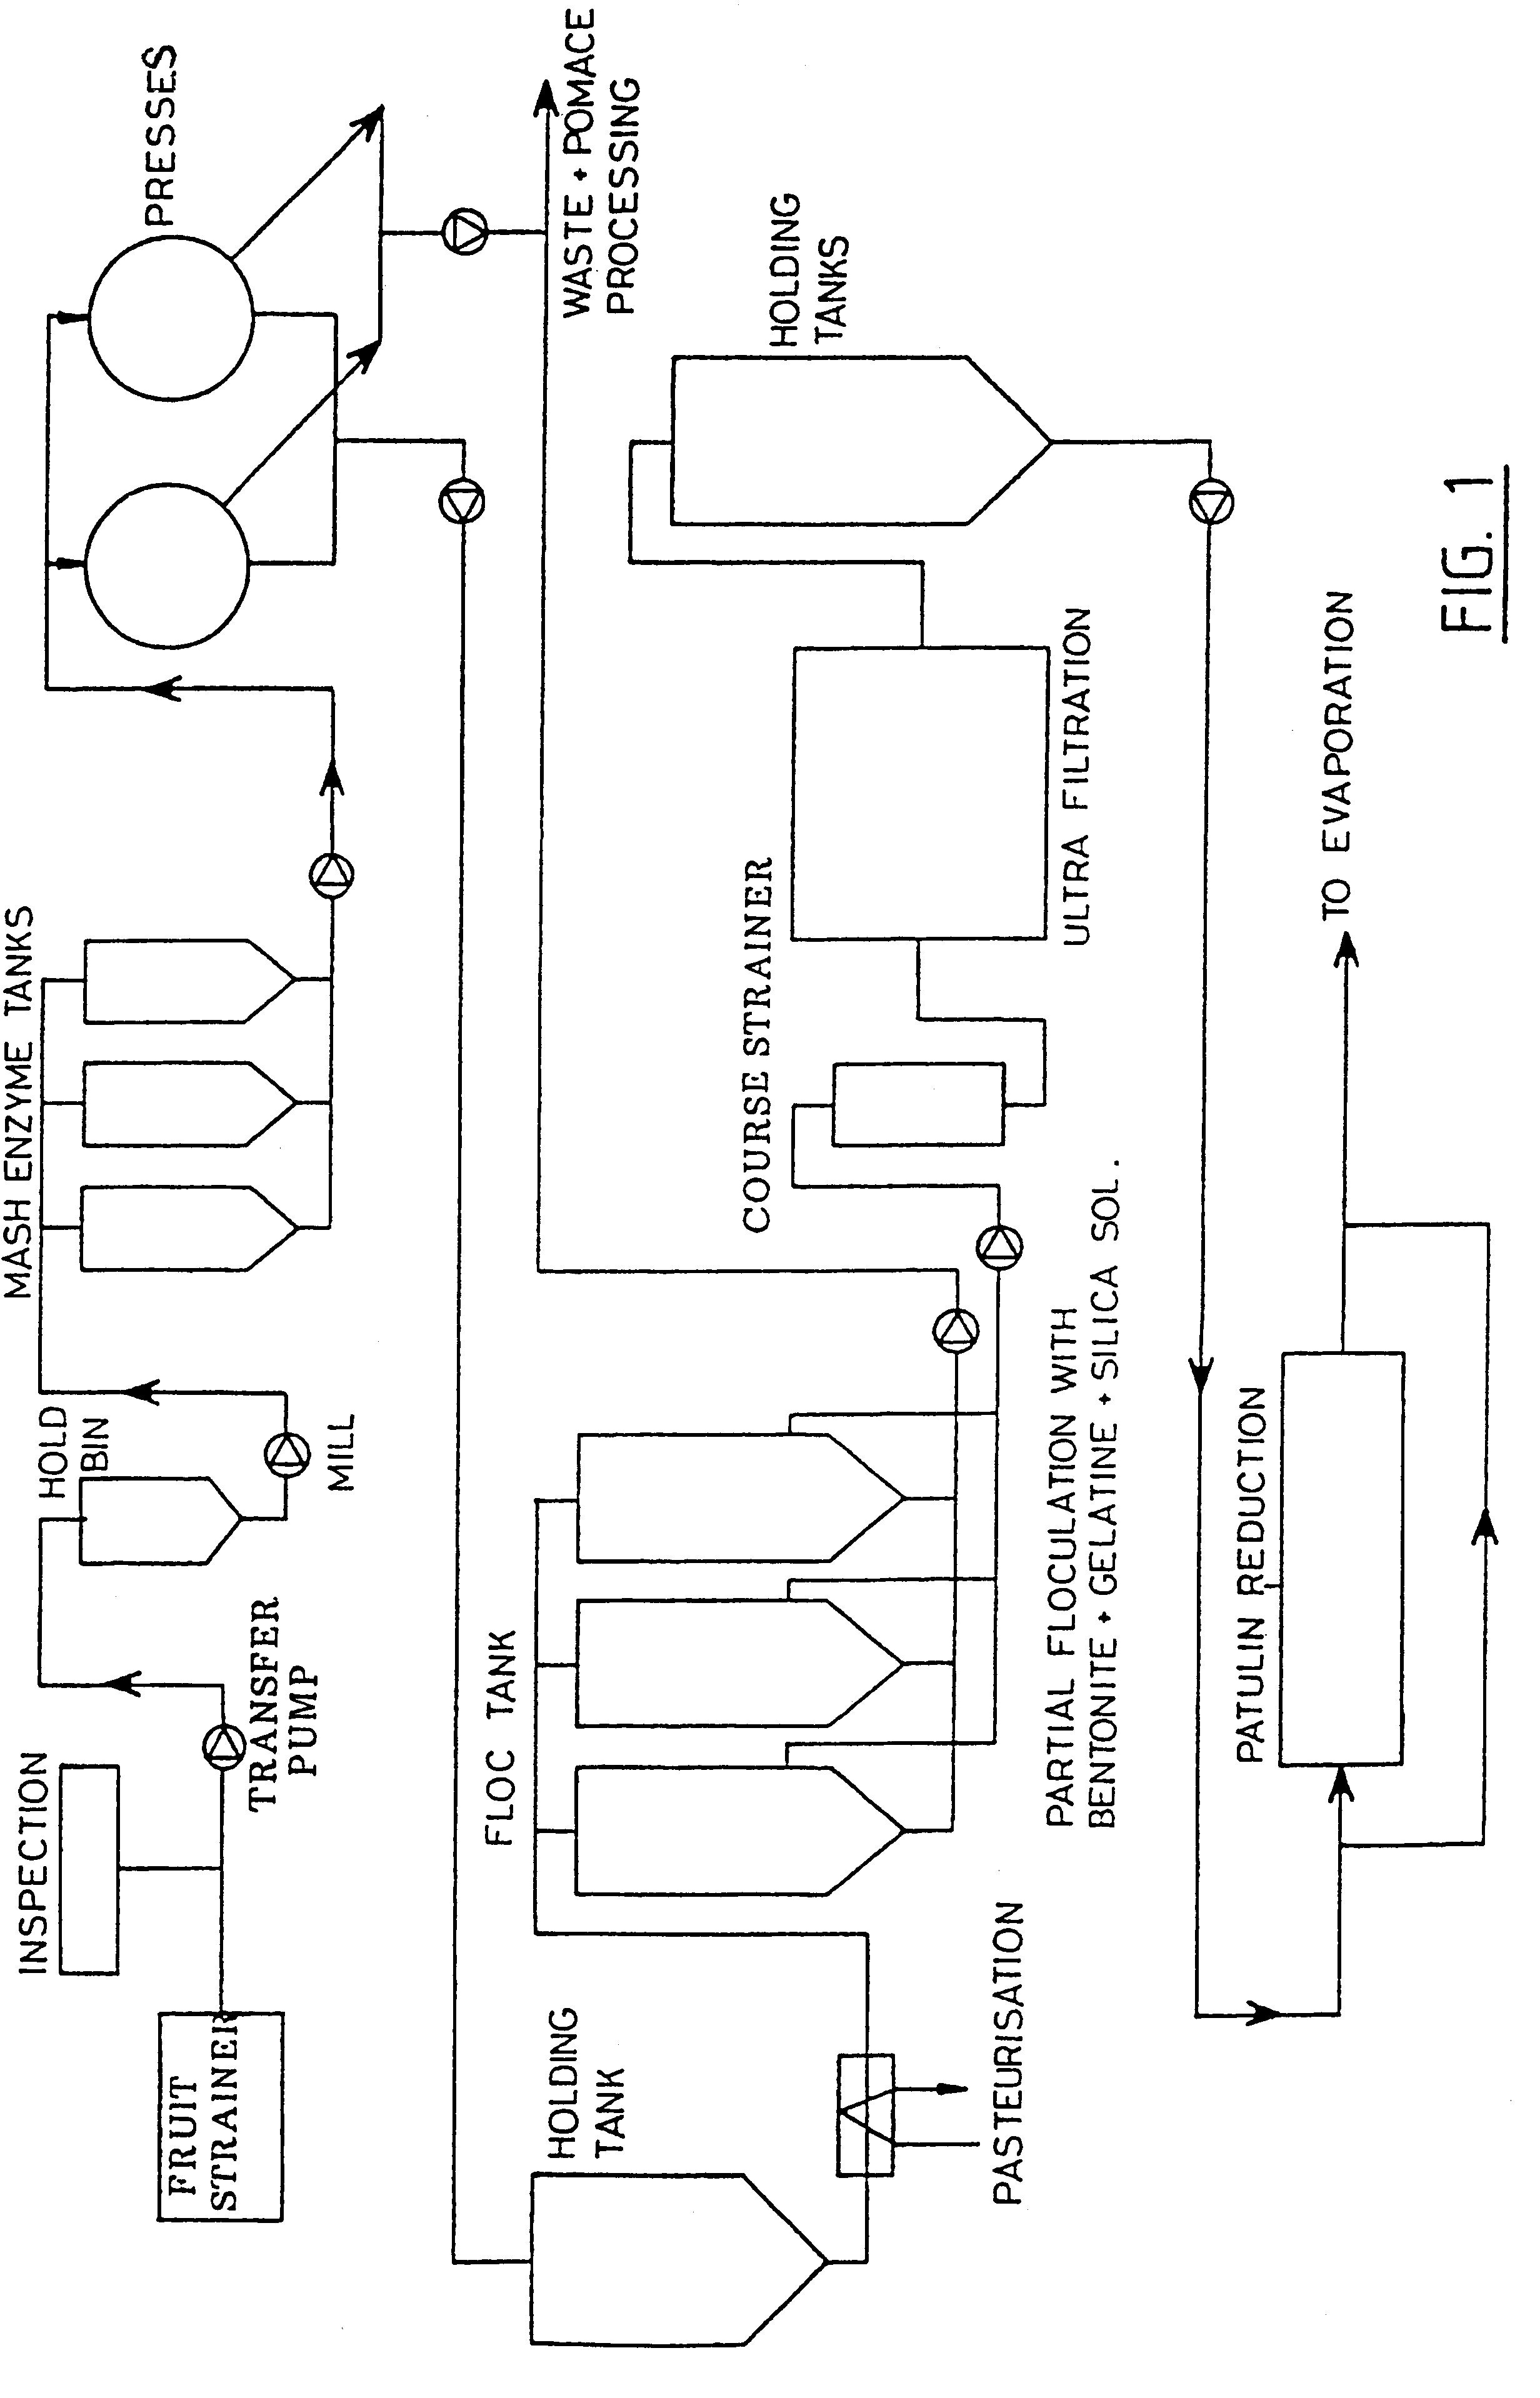 yakult process flow diagram blueraritan info rh blueraritan info Engineering Process Flow Diagram Engineering Process Flow Diagram